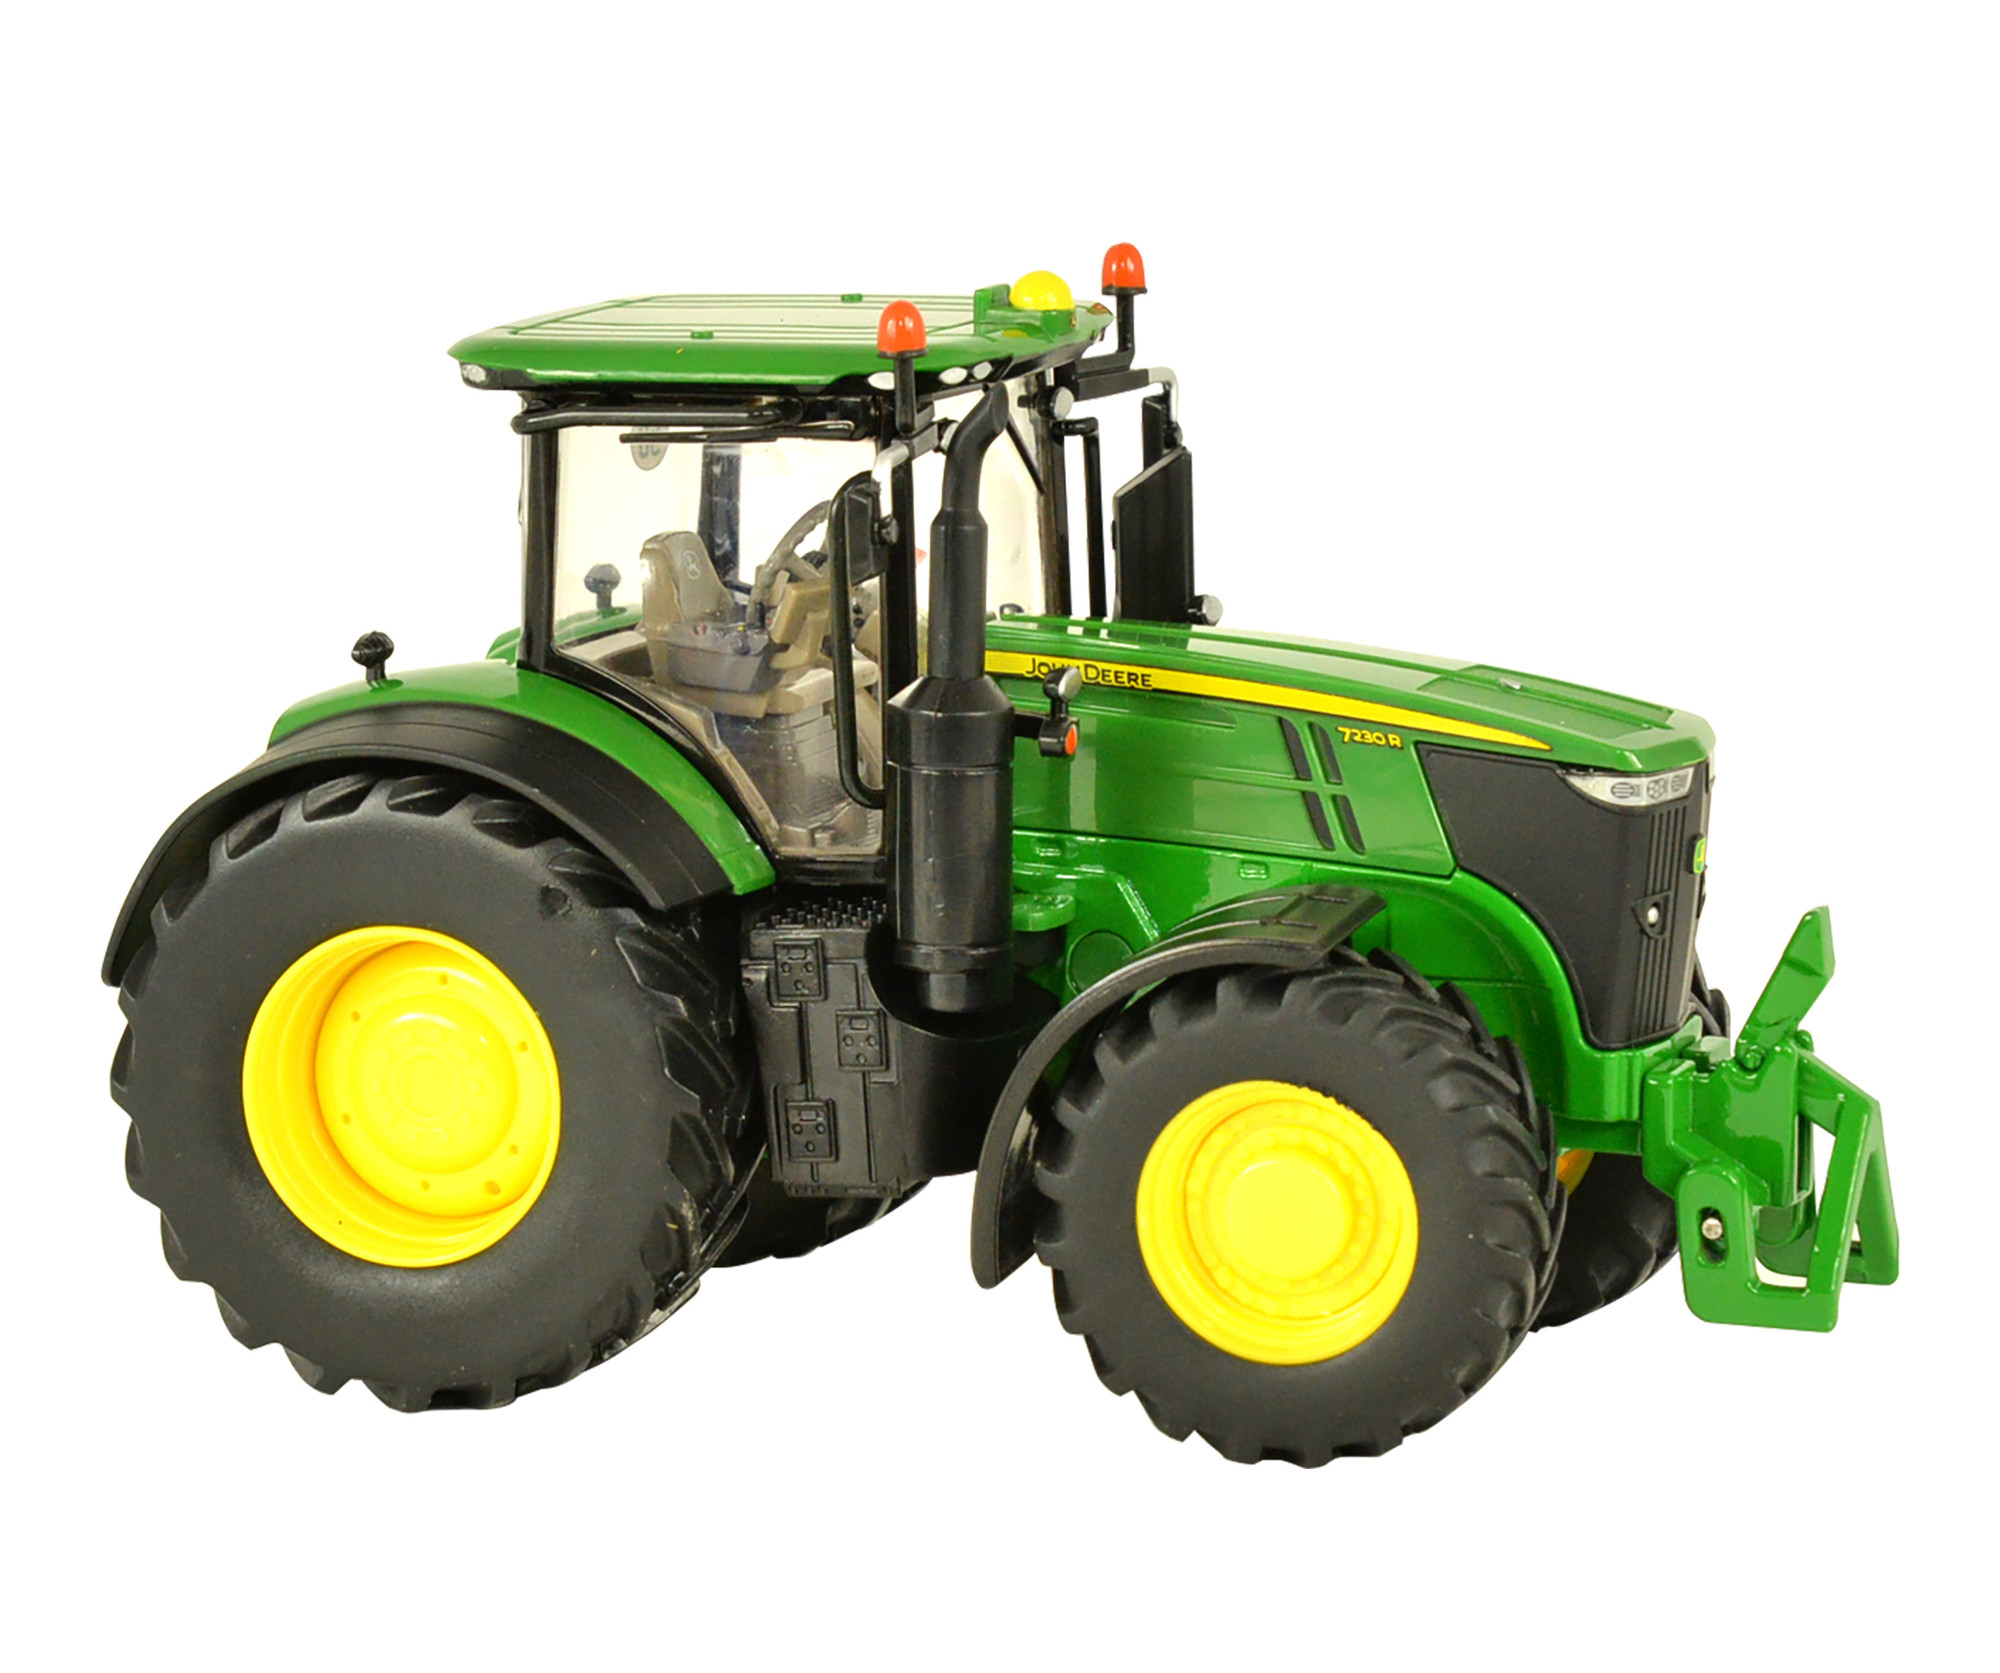 Britains 43089A1 John Deere 7230R Tractor